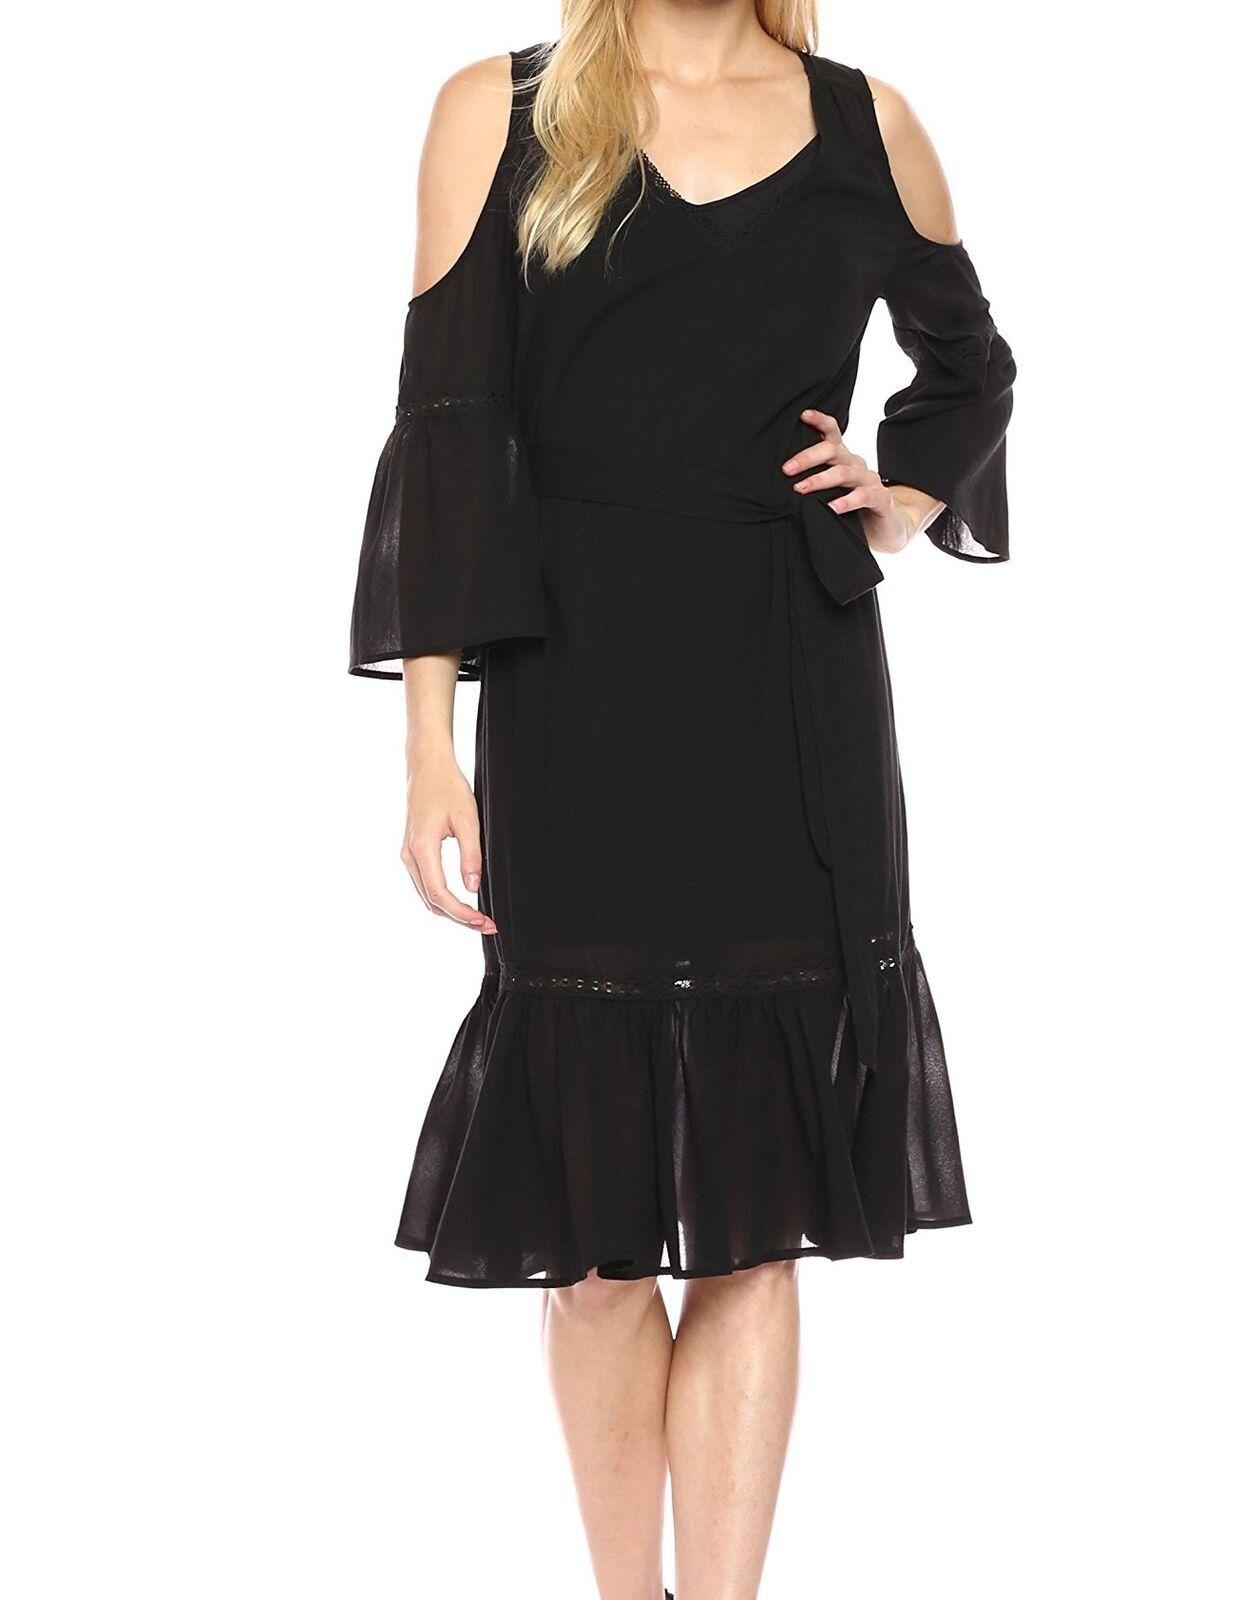 Trina Turk NEW schwarz Grand Dame Cold Shoulder Sheath Dress New sz 2